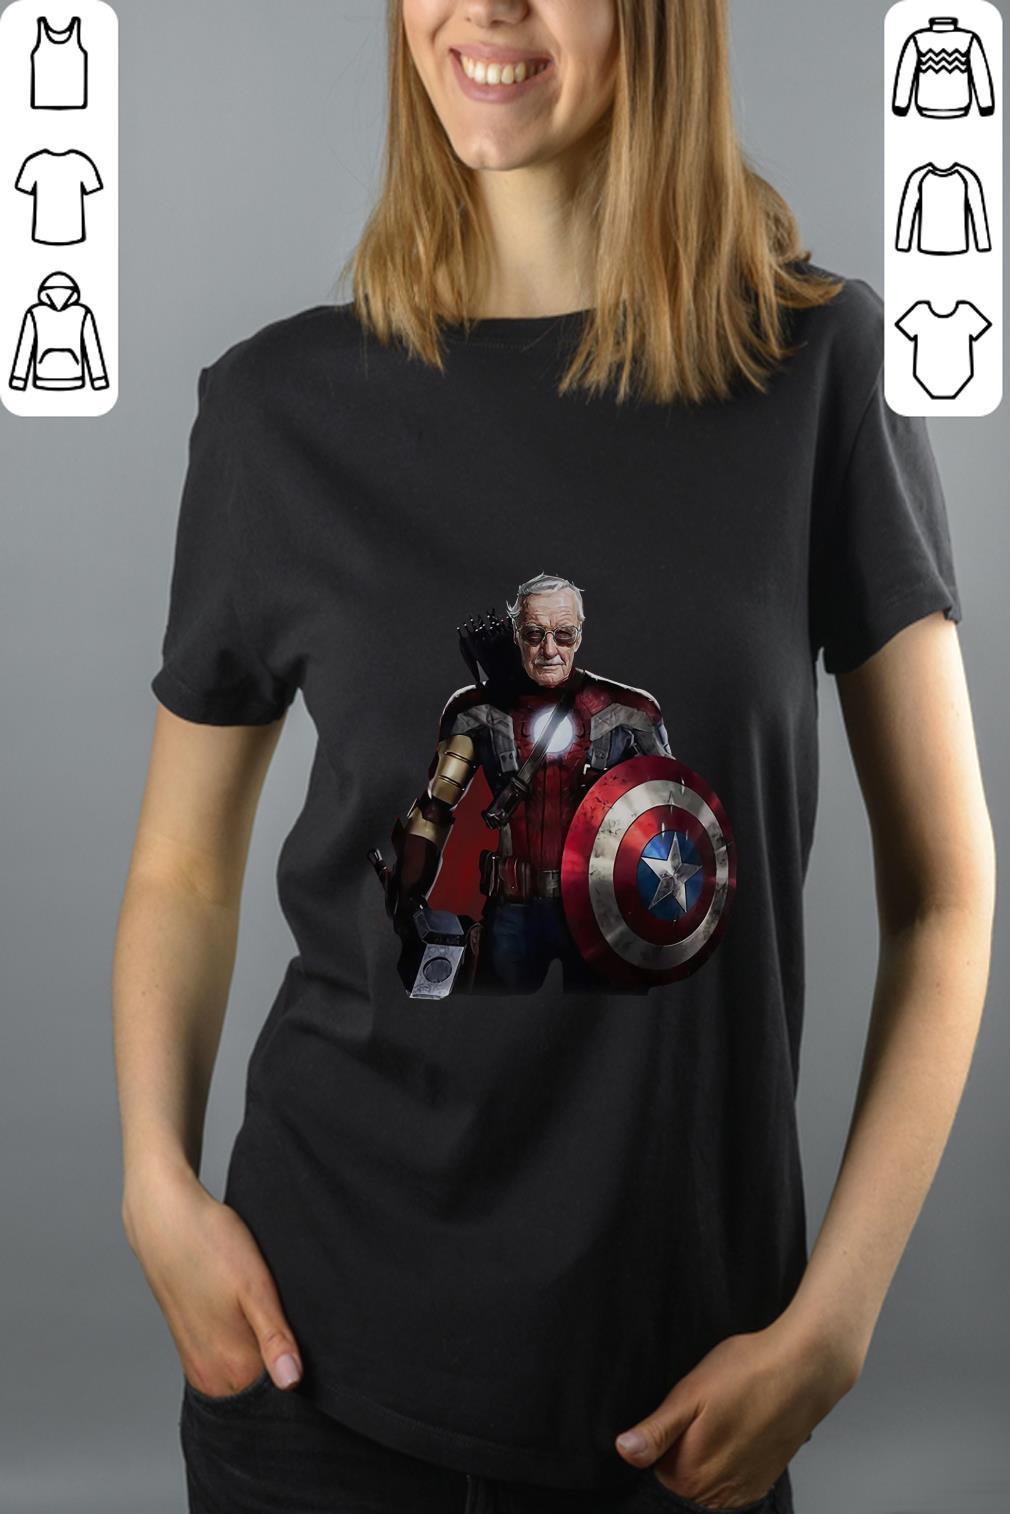 Funny Stan Lee Superhero shirt